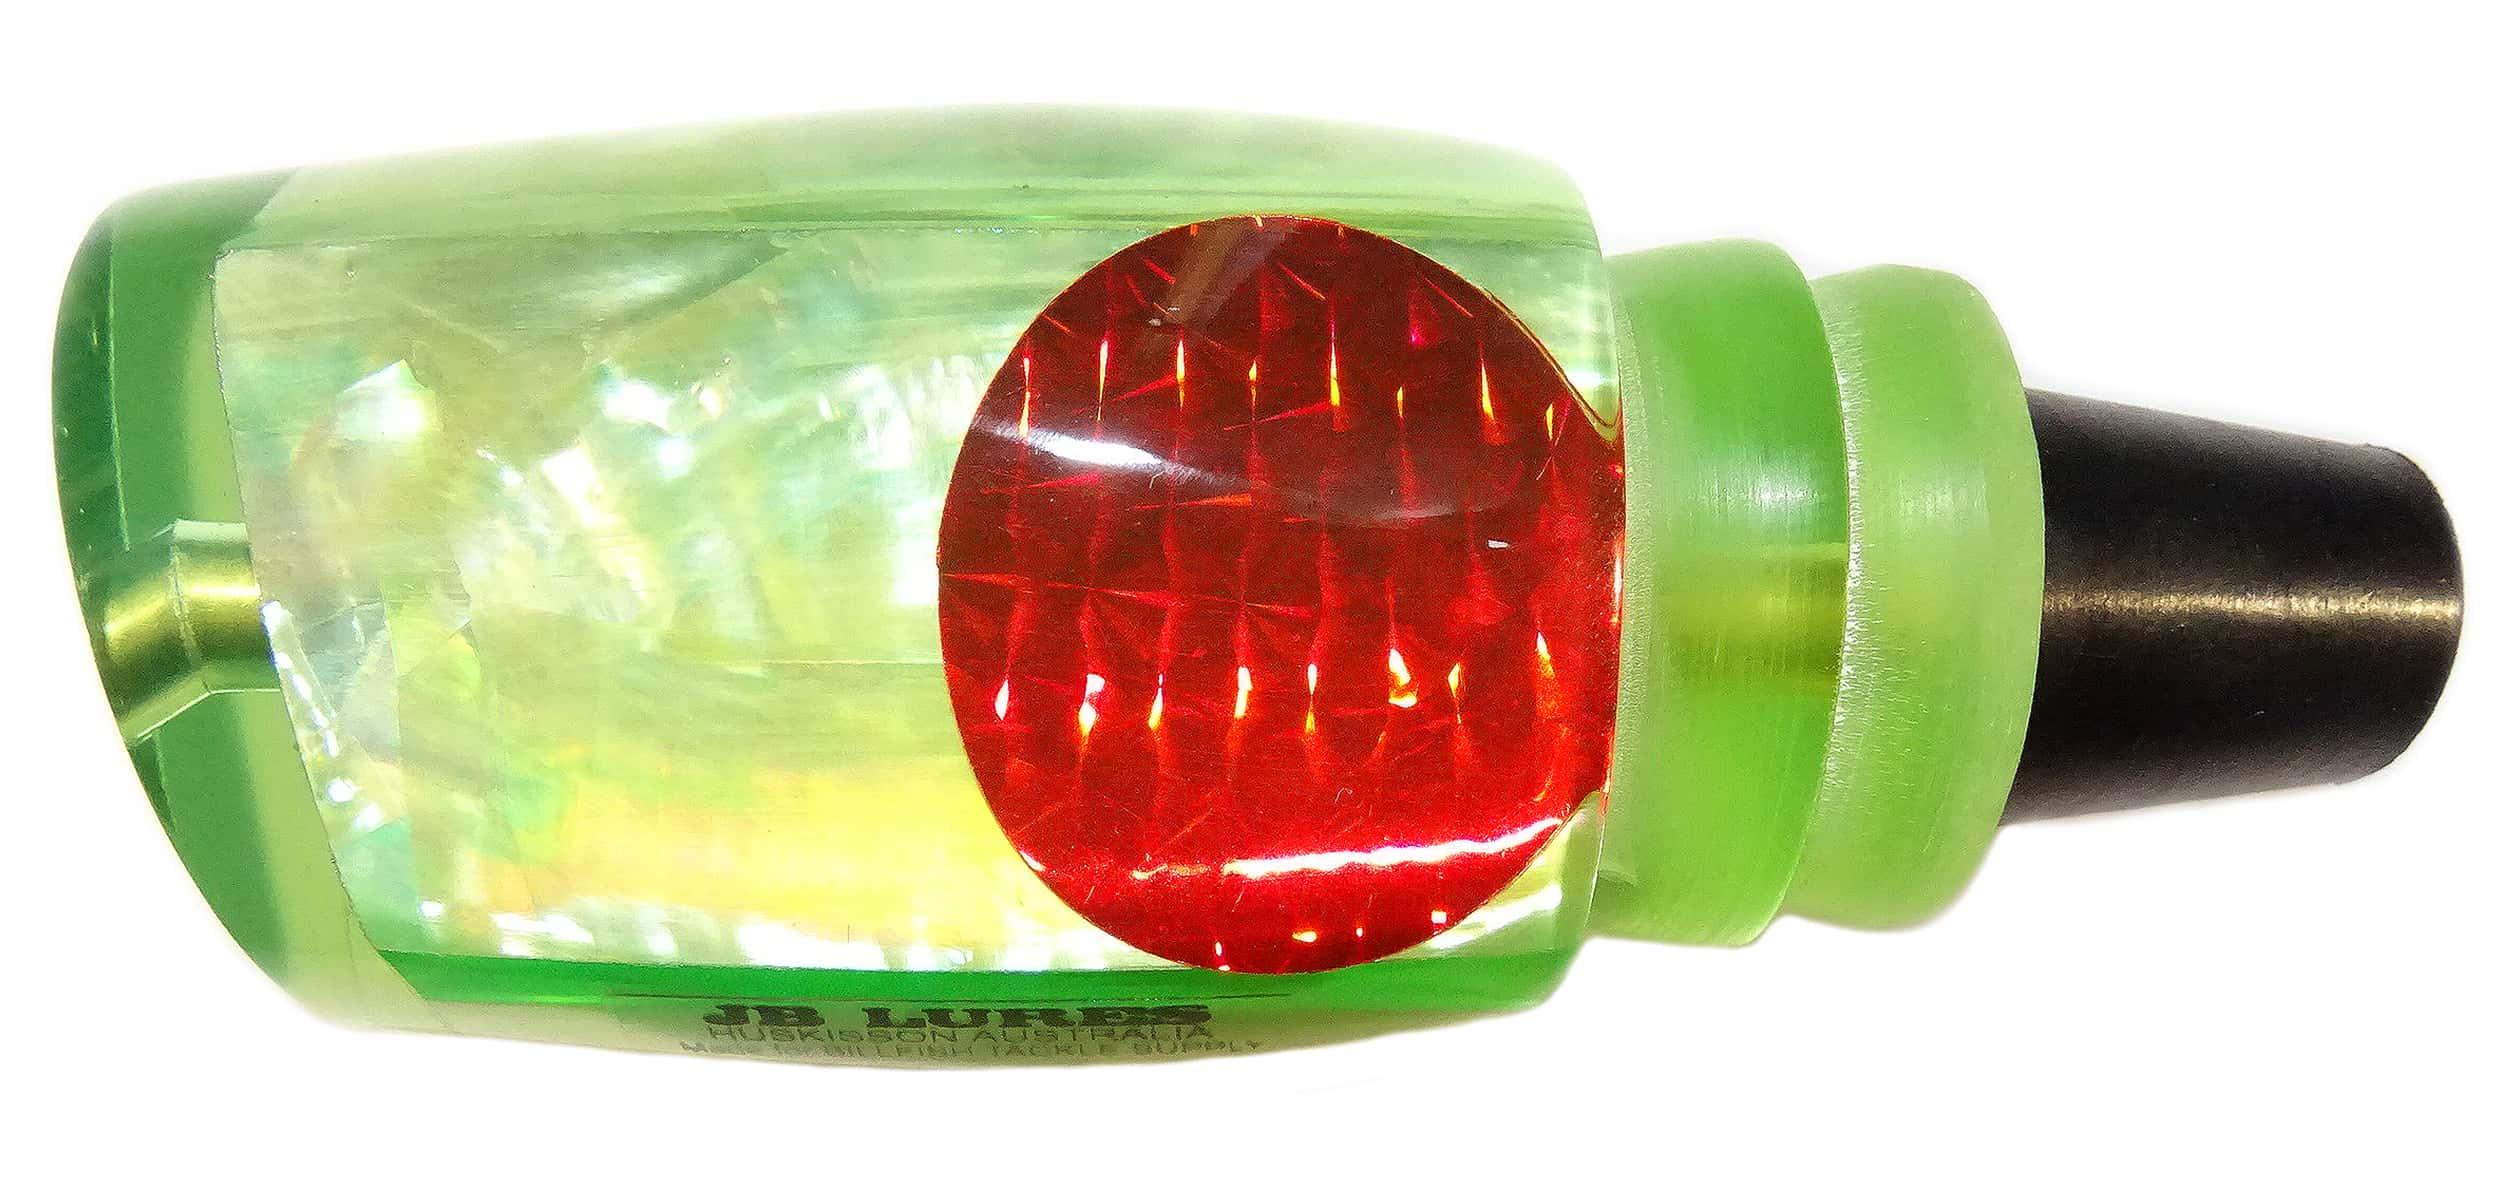 JB Lures - Chook Series - Head - Chartreuse Raw Agoya Shell